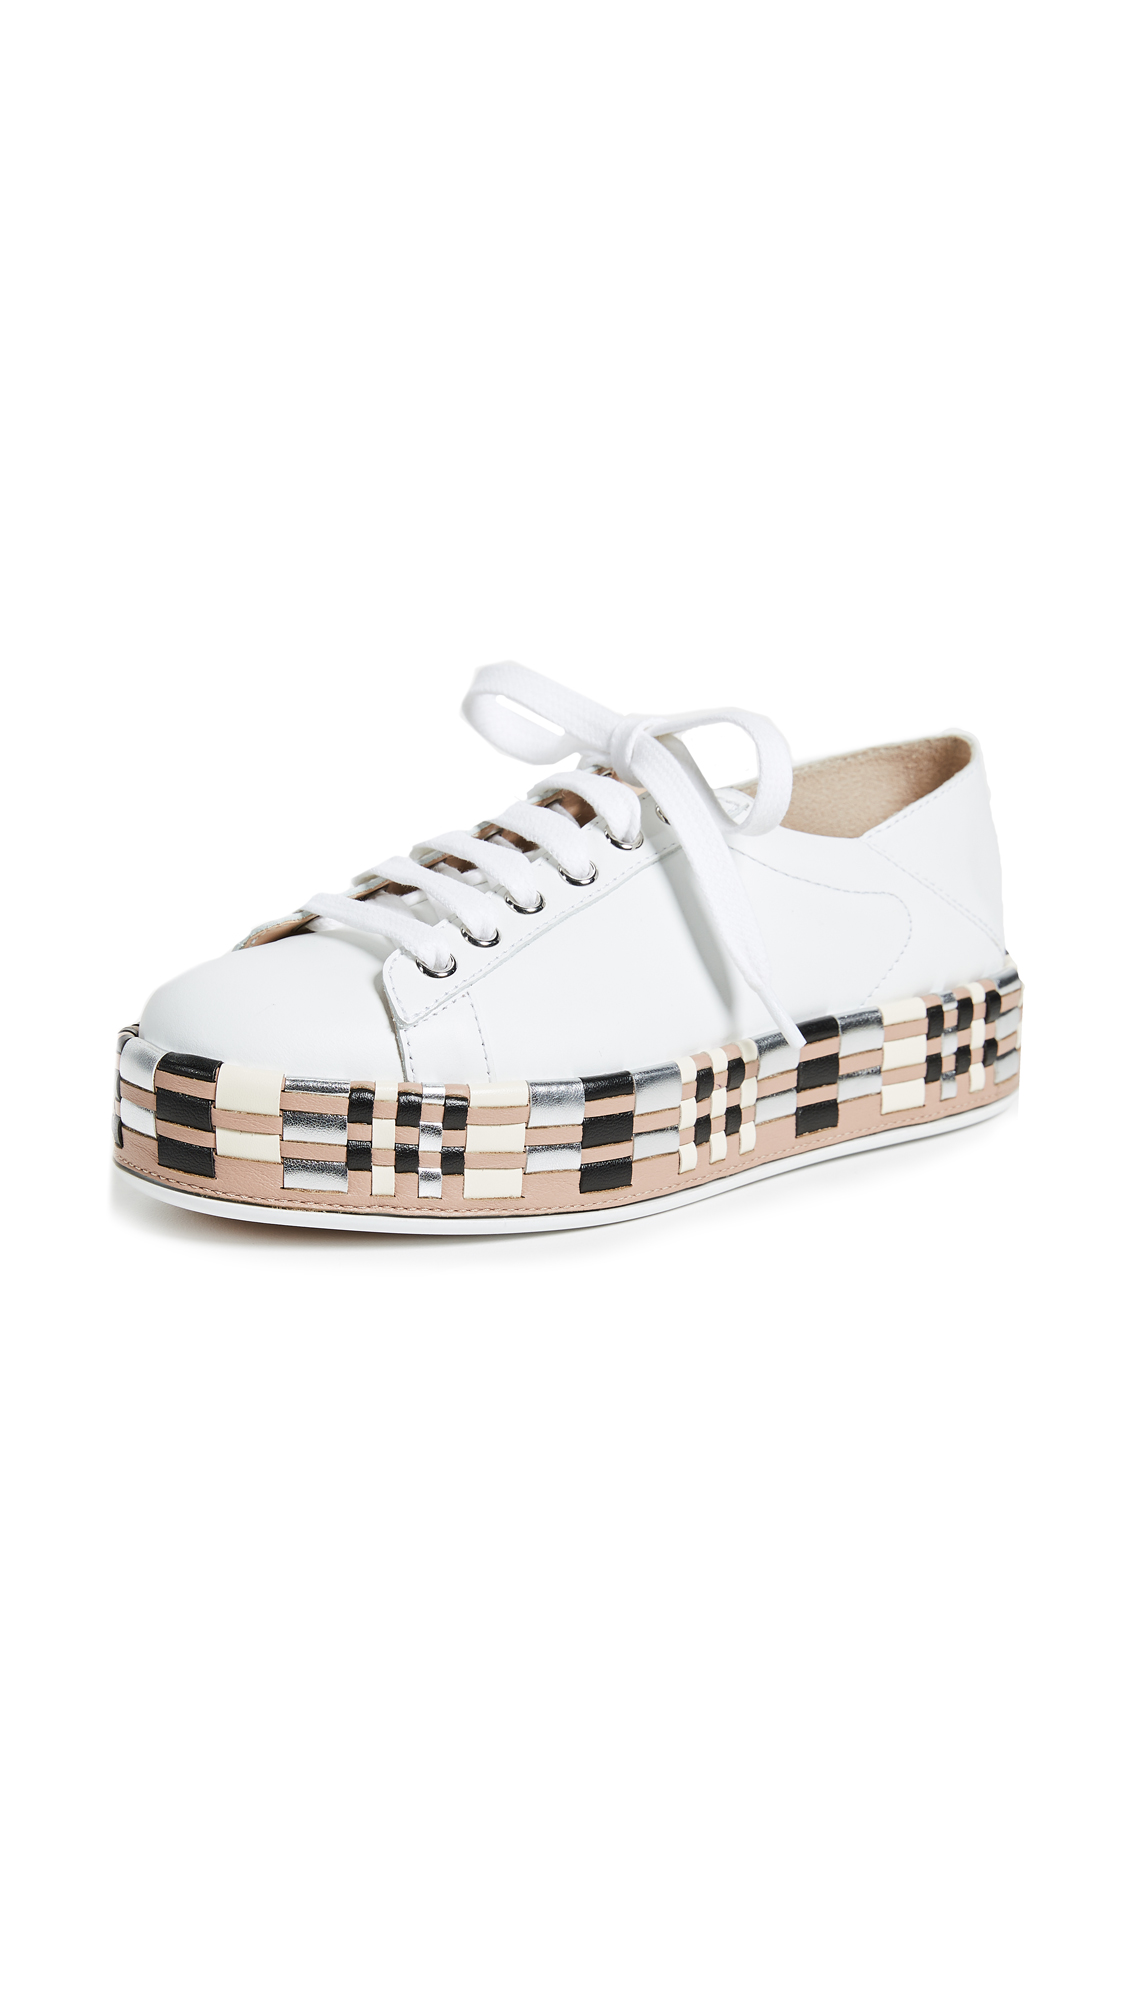 Greymer Art Safi Stepdown Sneakers - Vitello Bianco